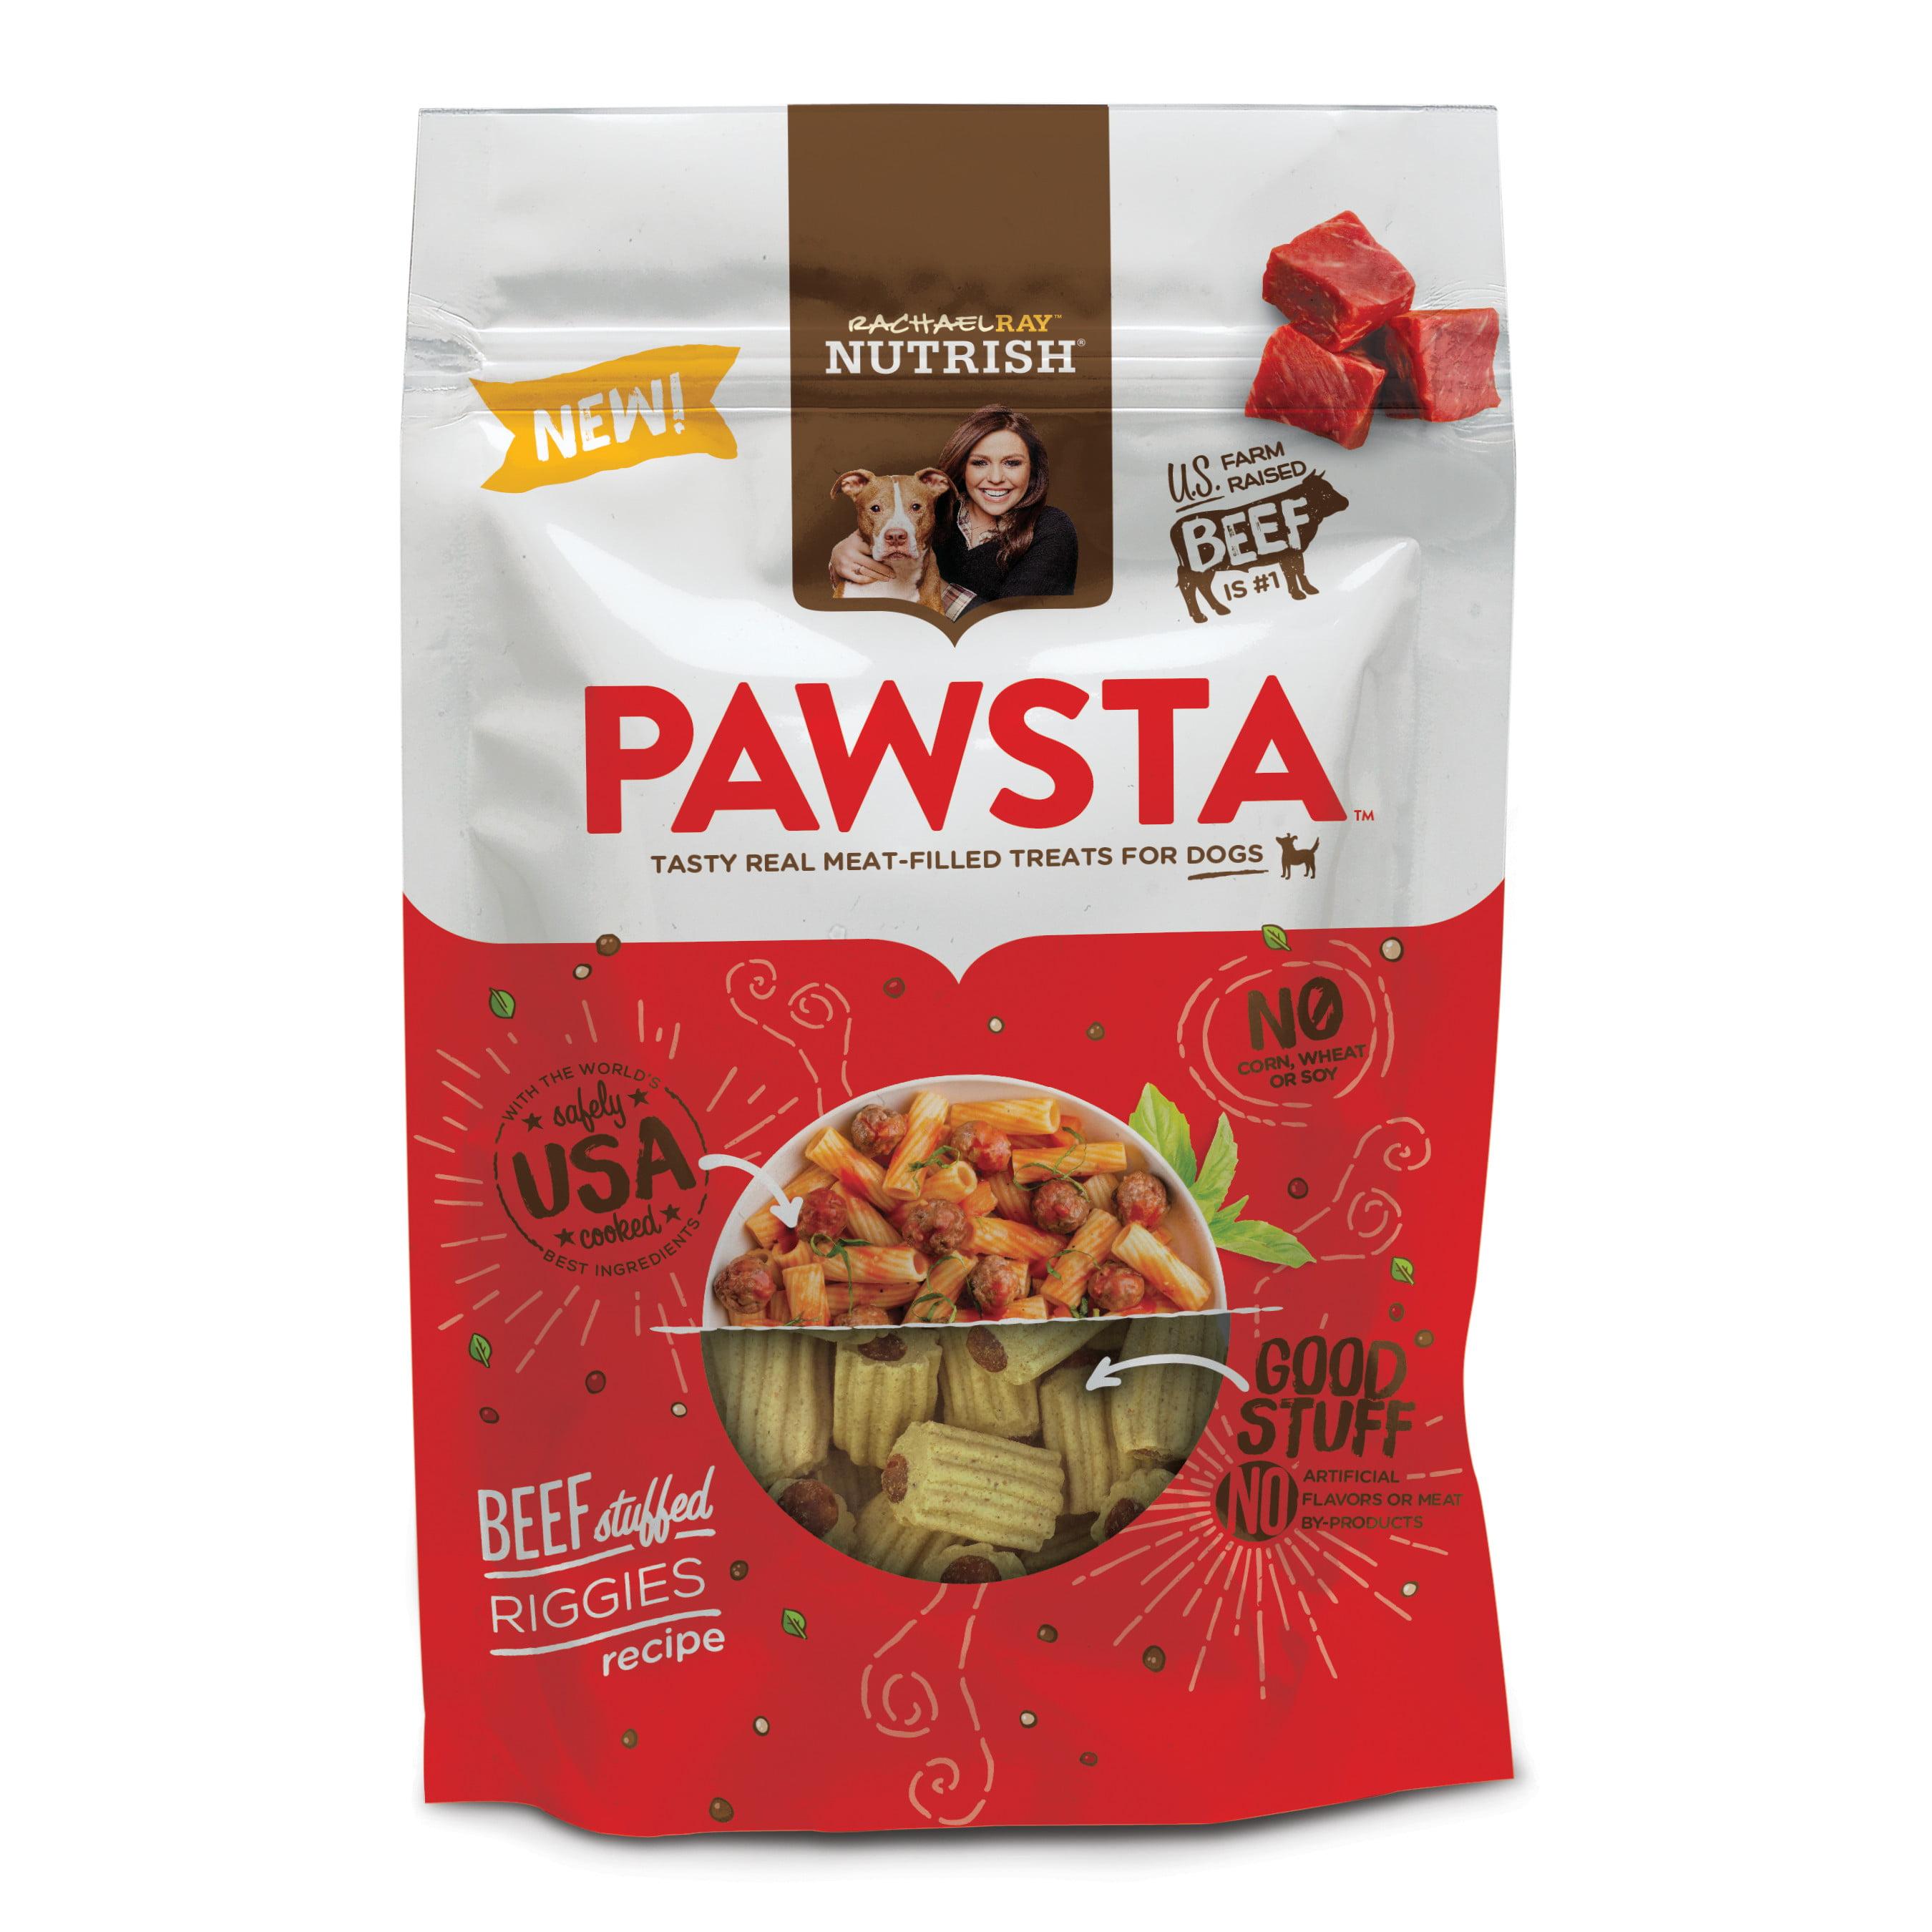 Rachael Ray Nutrish Pawsta Dog Treats, Riggies Stuffed with Beef Recipe, 4.5 oz by AINSWORTH PET NUTRITION